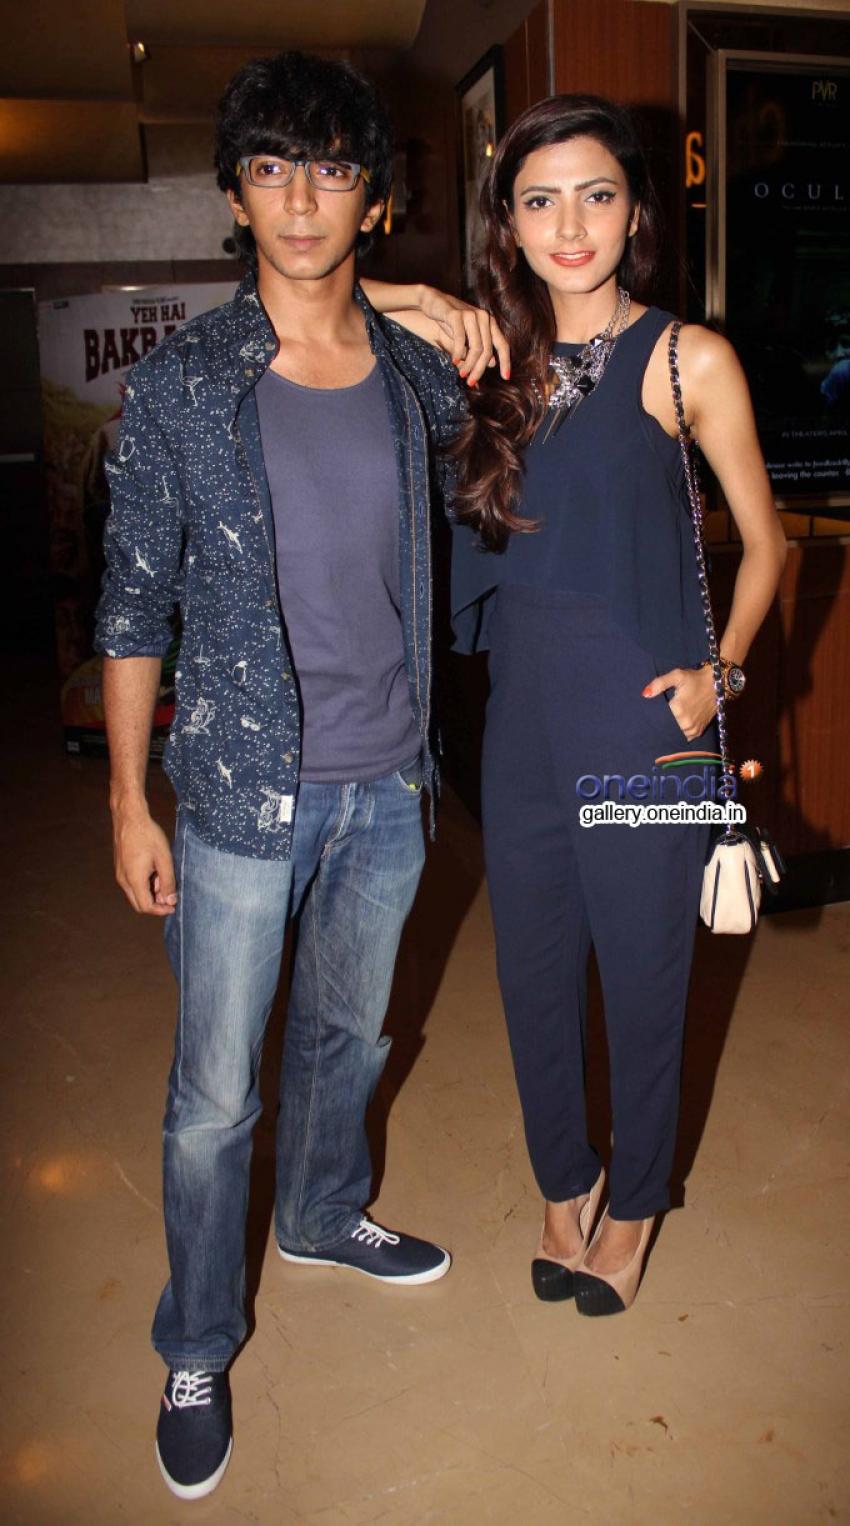 Yeh Hai Bakrapur film premiere at PVR Juhu Photos